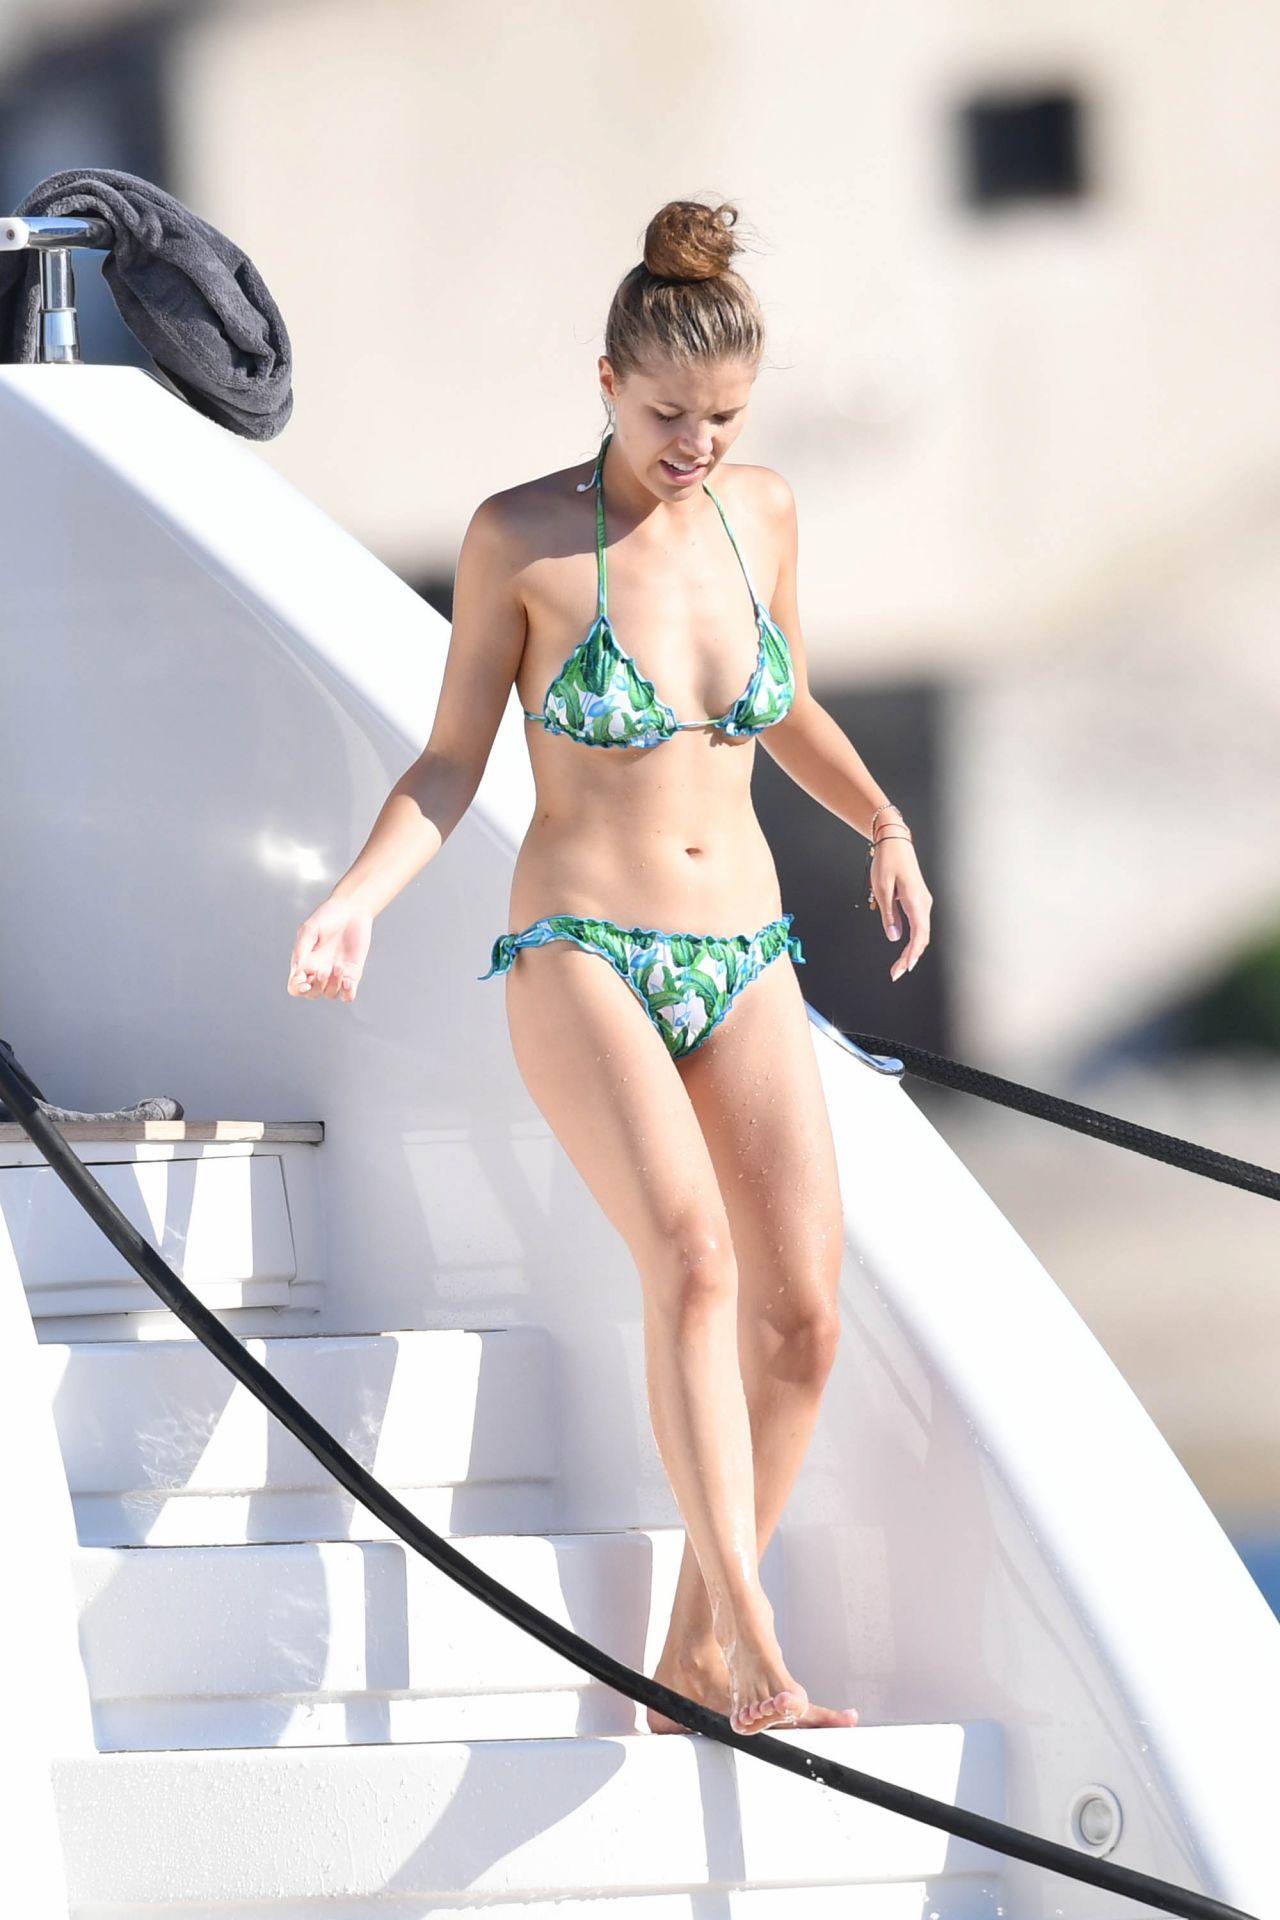 Victoria Swarovski Bikini Candids Saint Tropez 06 19 2017